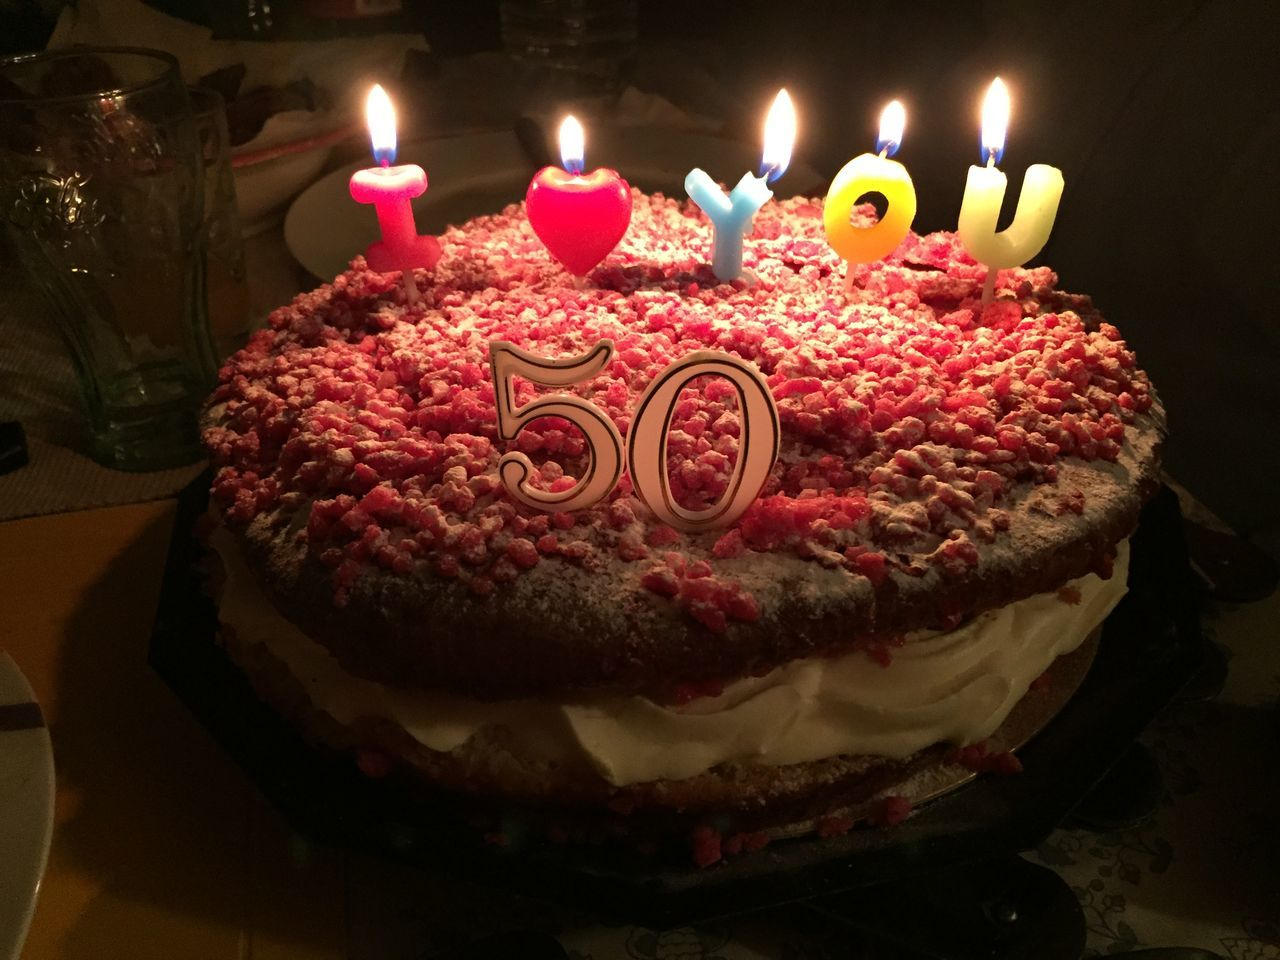 Happy birthday father ❤️🎂 Happy Birthday Cake Happy Birthday! Birthday Taking Photos Iphone 6 IPhoneography Dad Love Enjoying Life